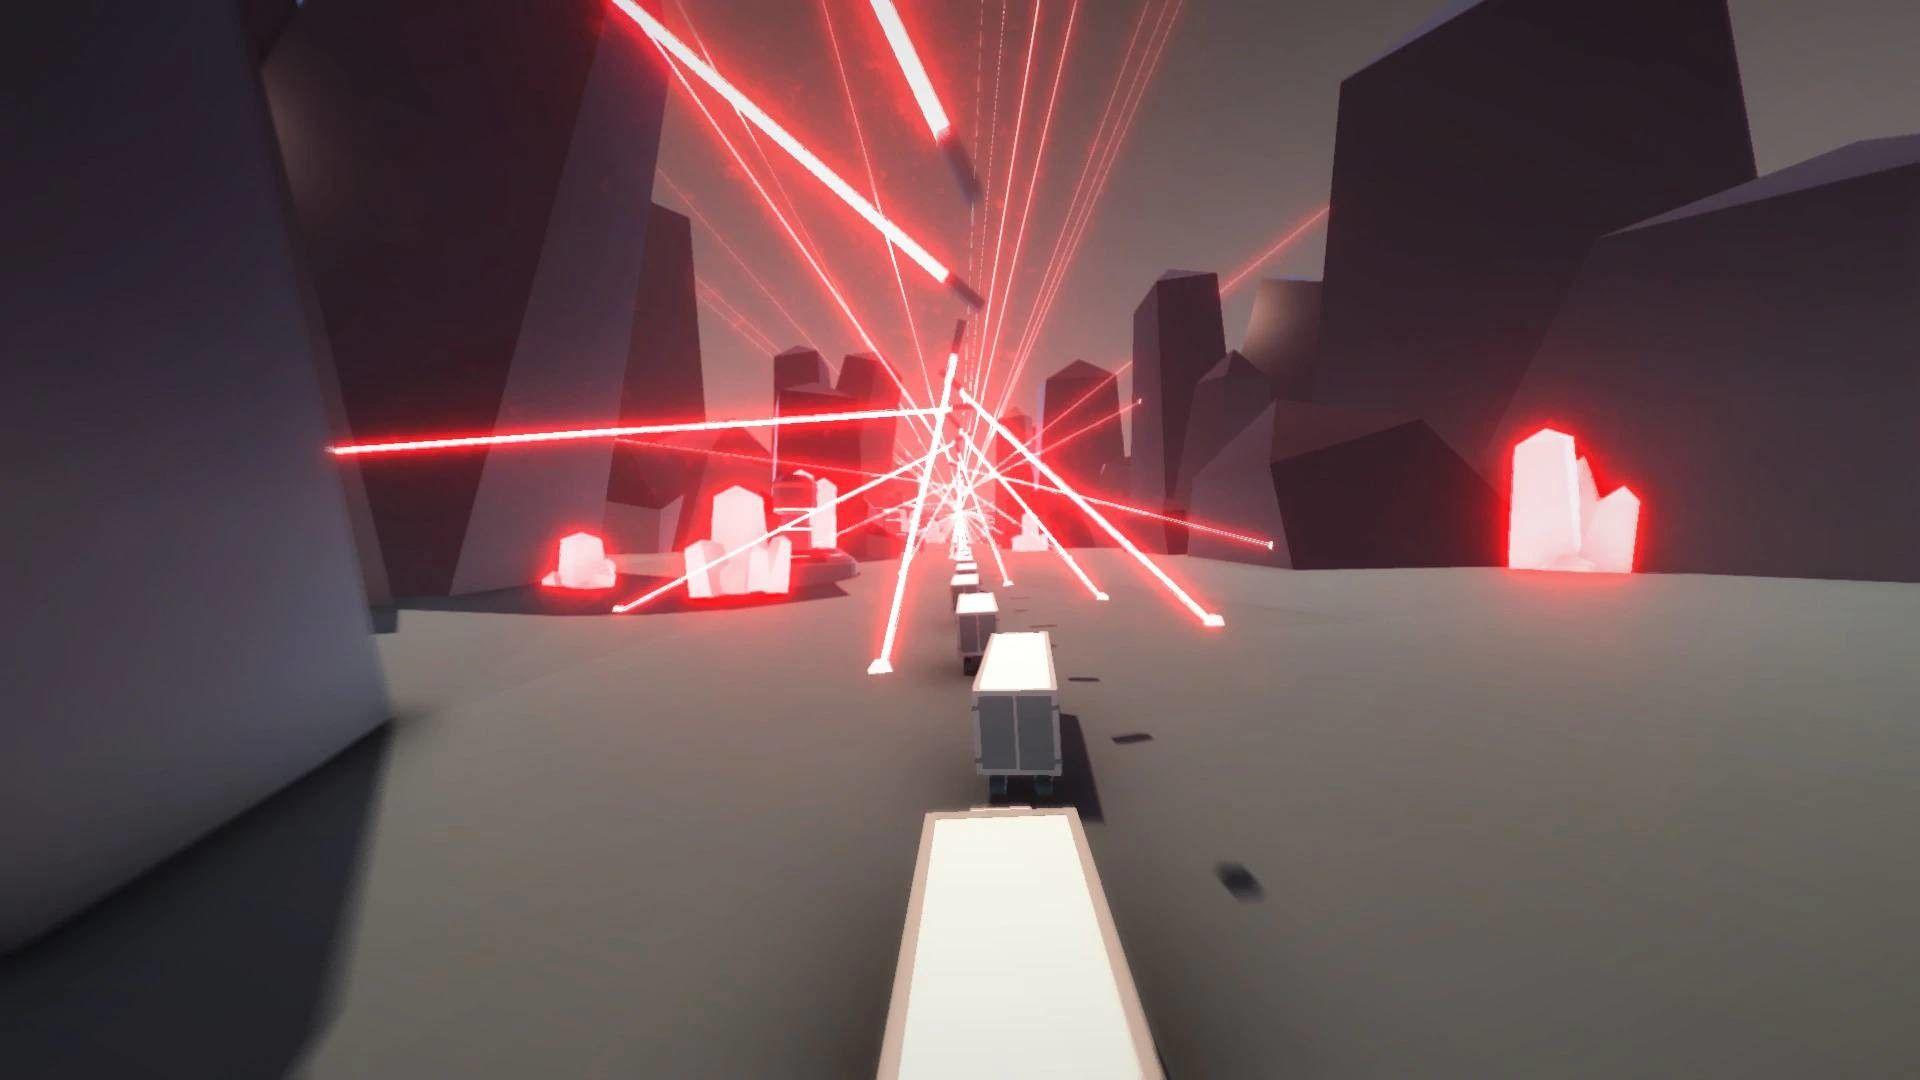 Image for Xbox Game Pass hidden gem: Don't miss this 3D platformer like nothing else